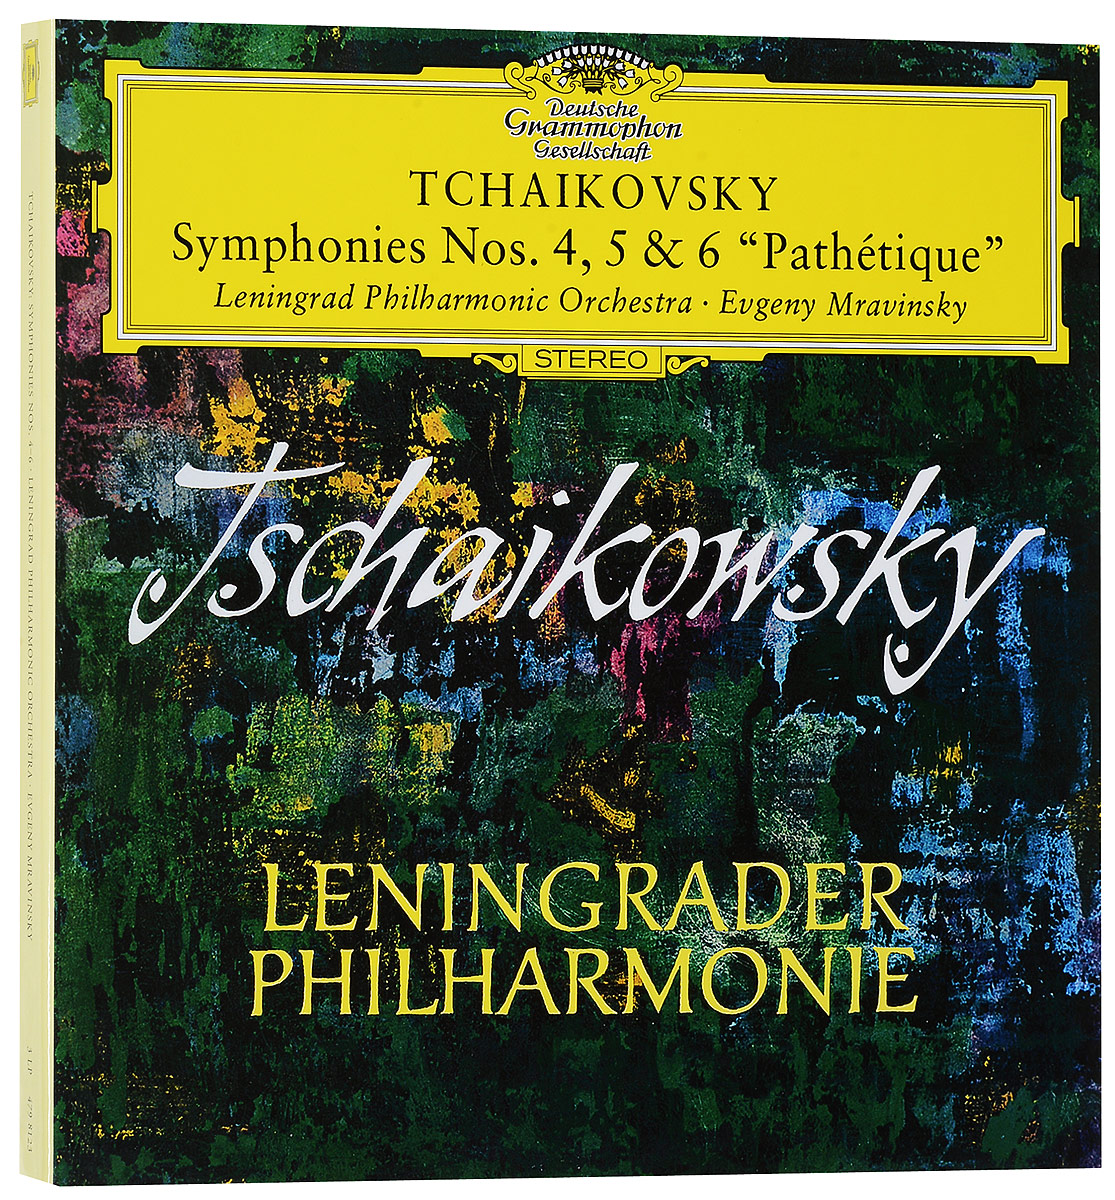 Ленинградский филармонический оркестр Leningrad Philharmonic Orchestra, Jewgenij Mrawinskij. Tchaikovsky: Symphonies Nos.4, 5 & 6